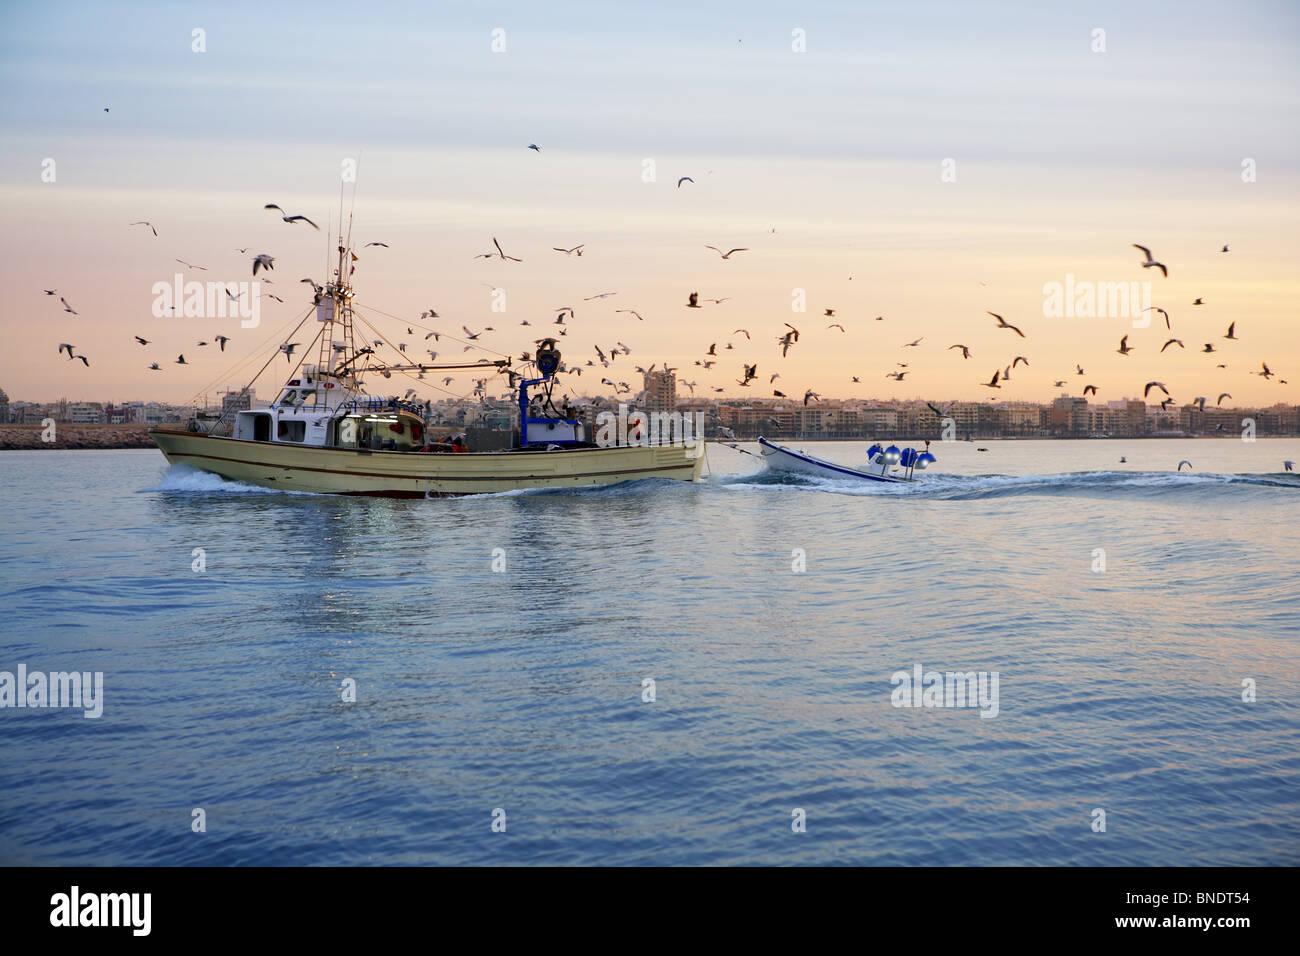 Barco de pesca profesional y vuelta Puerto Gaviota en sunset sunrise Foto de stock